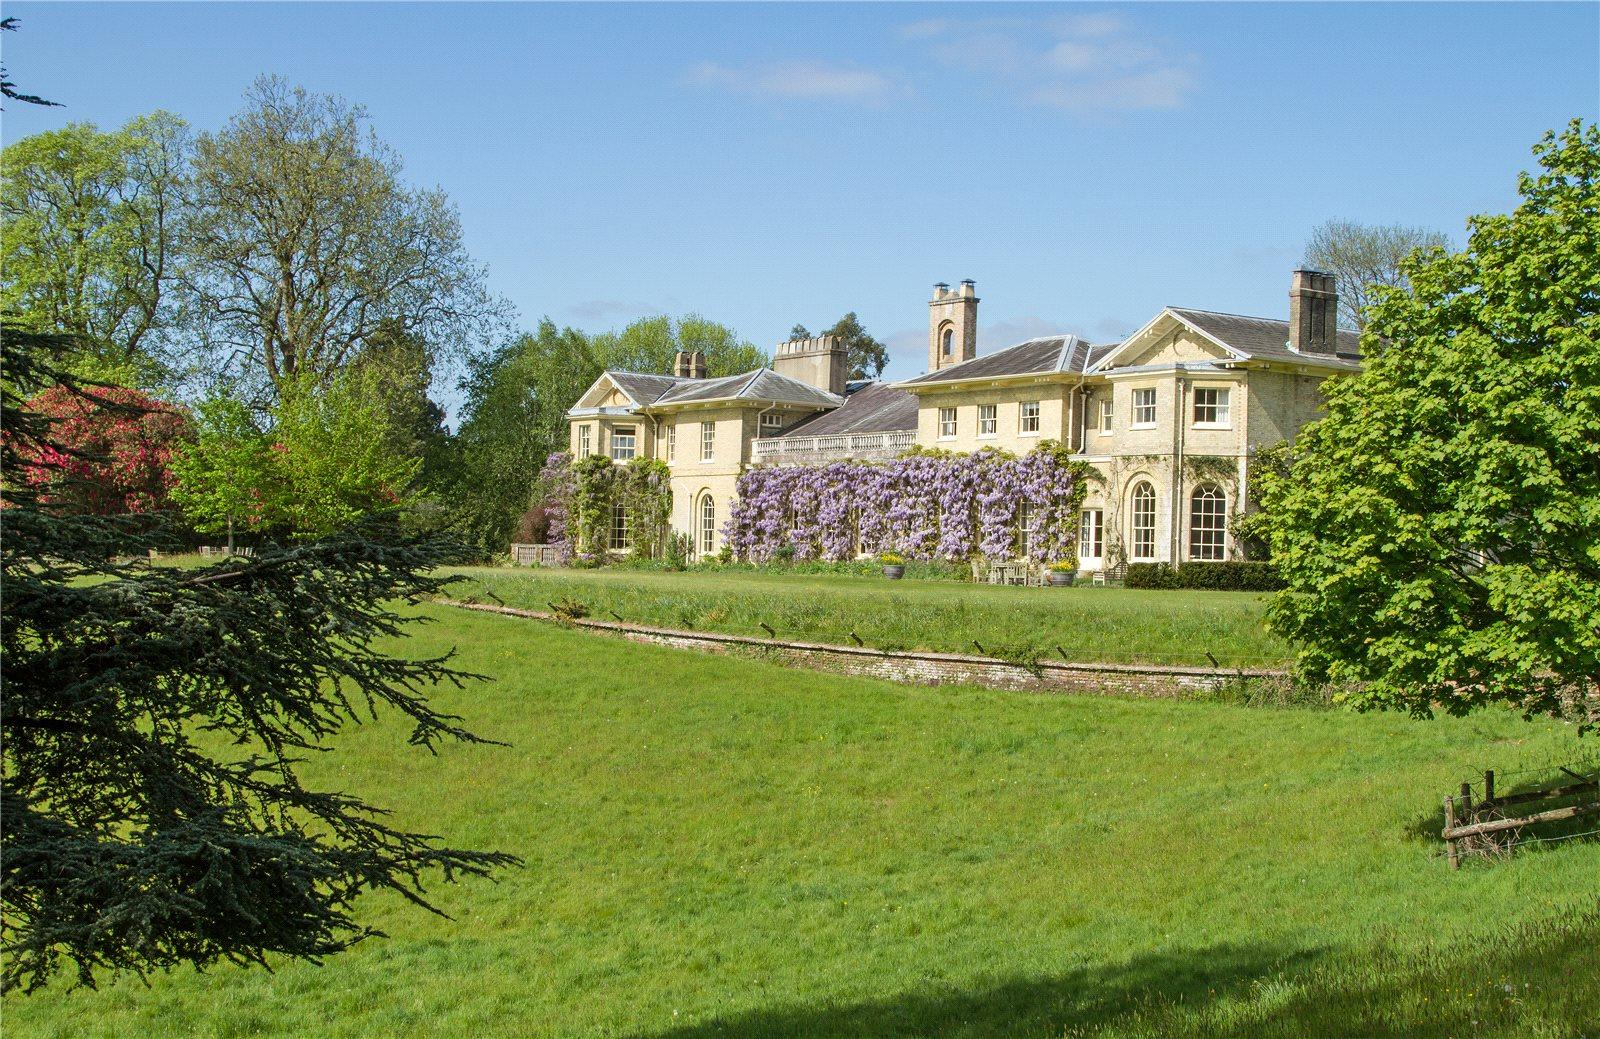 Apartments / Residences for Sale at Bramshaw, Lyndhurst, Hampshire, SO43 Lyndhurst, England